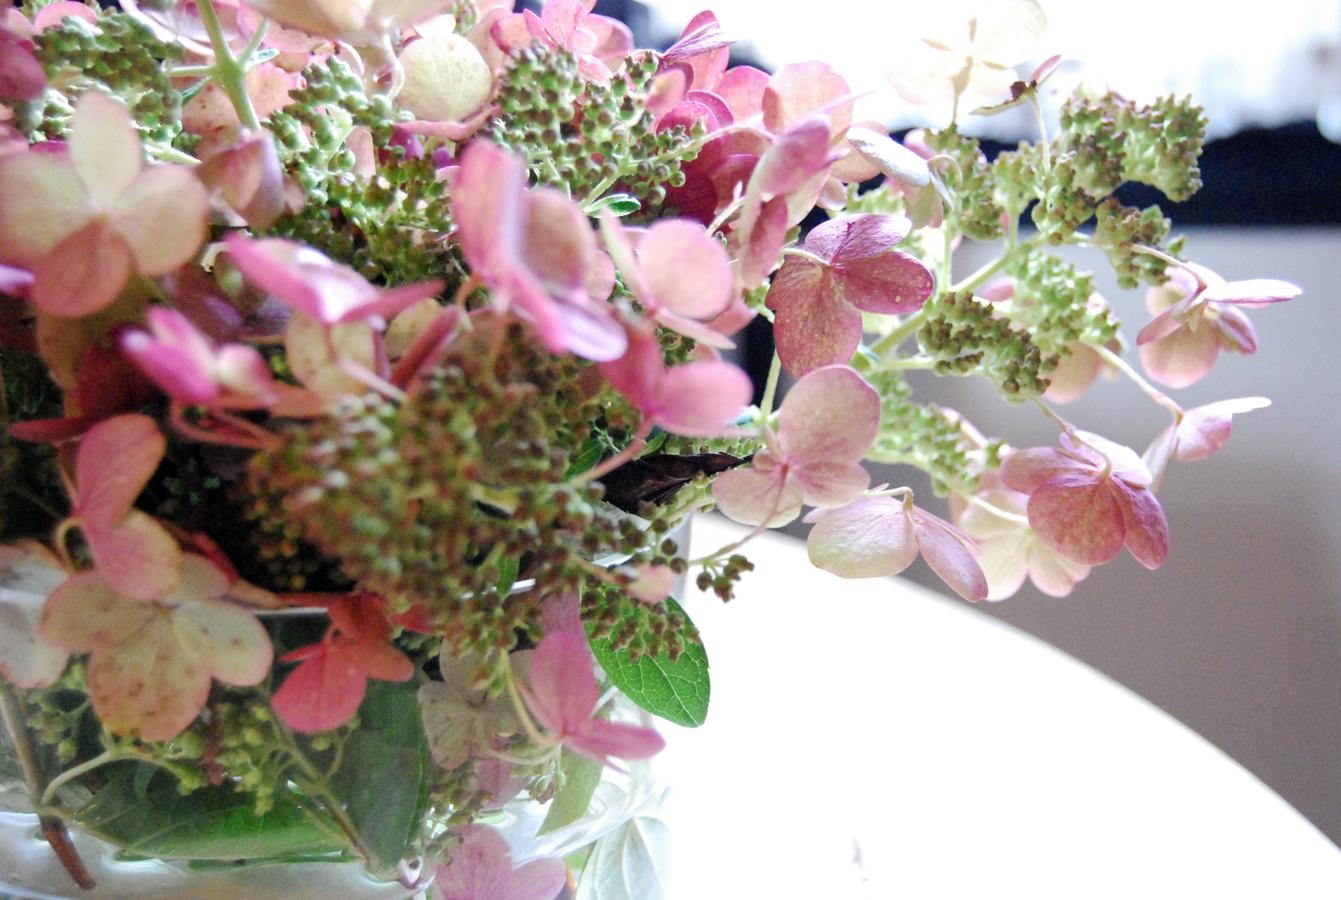 hydrangeaflowers.jpg